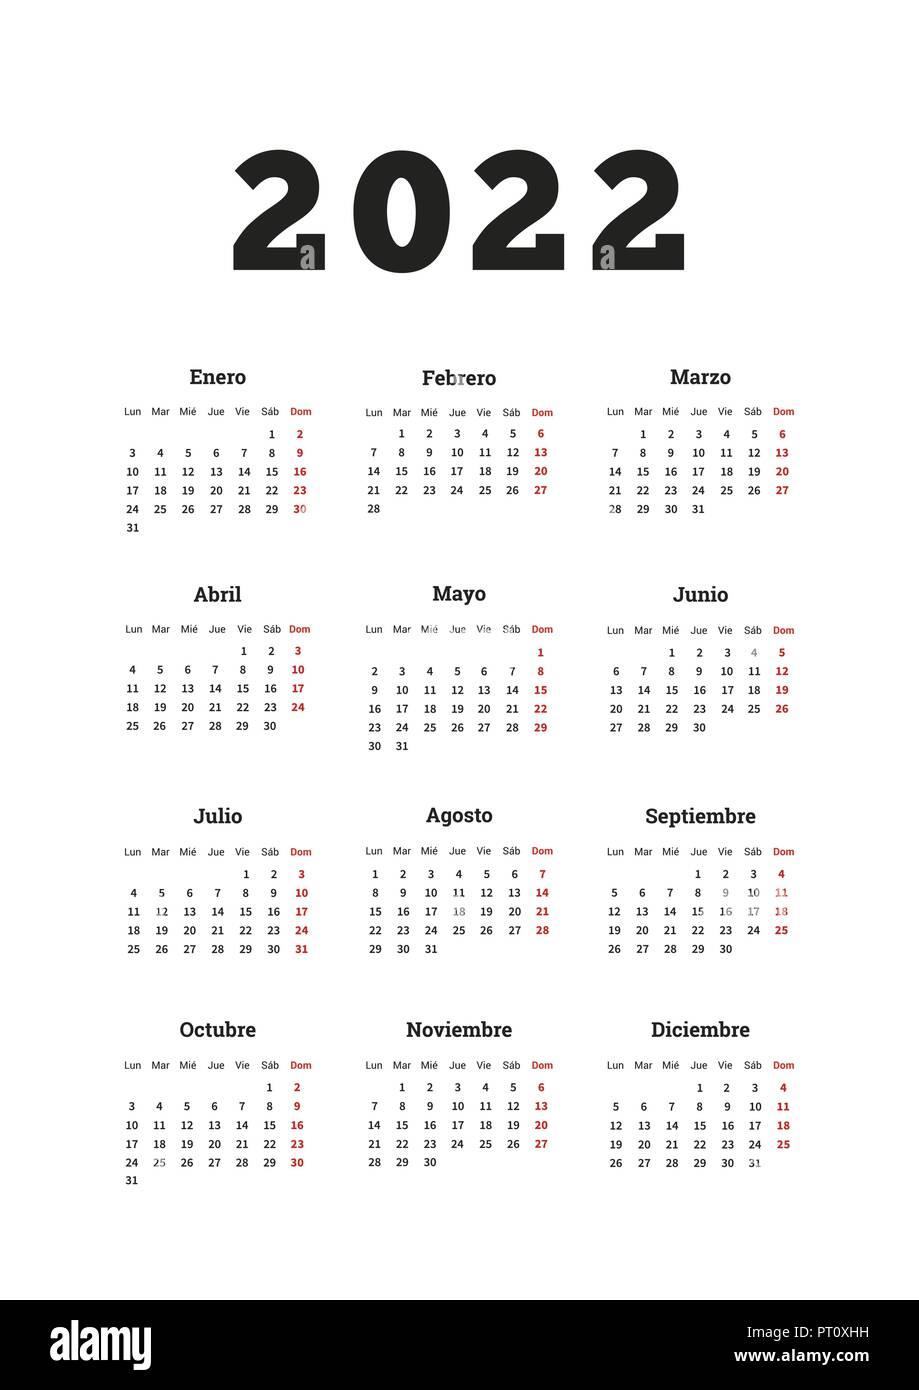 Spanish Calendar 2022.2022 Year Simple Calendar In Spanish A4 Size Vertical Sheet On White Stock Vector Image Art Alamy